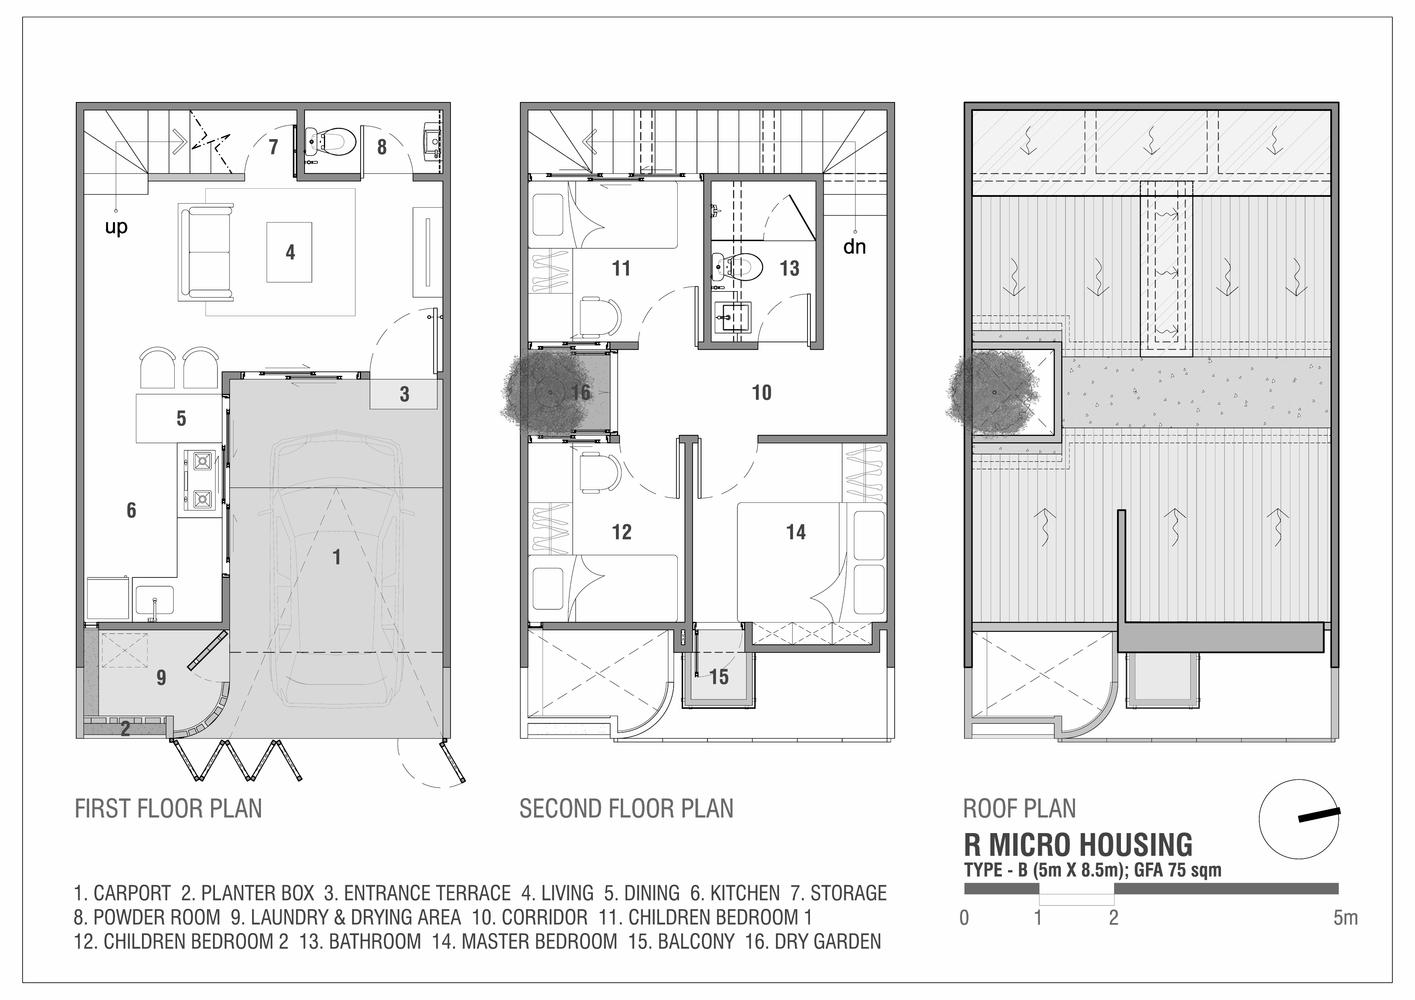 R Micro Housing_TYPE_B